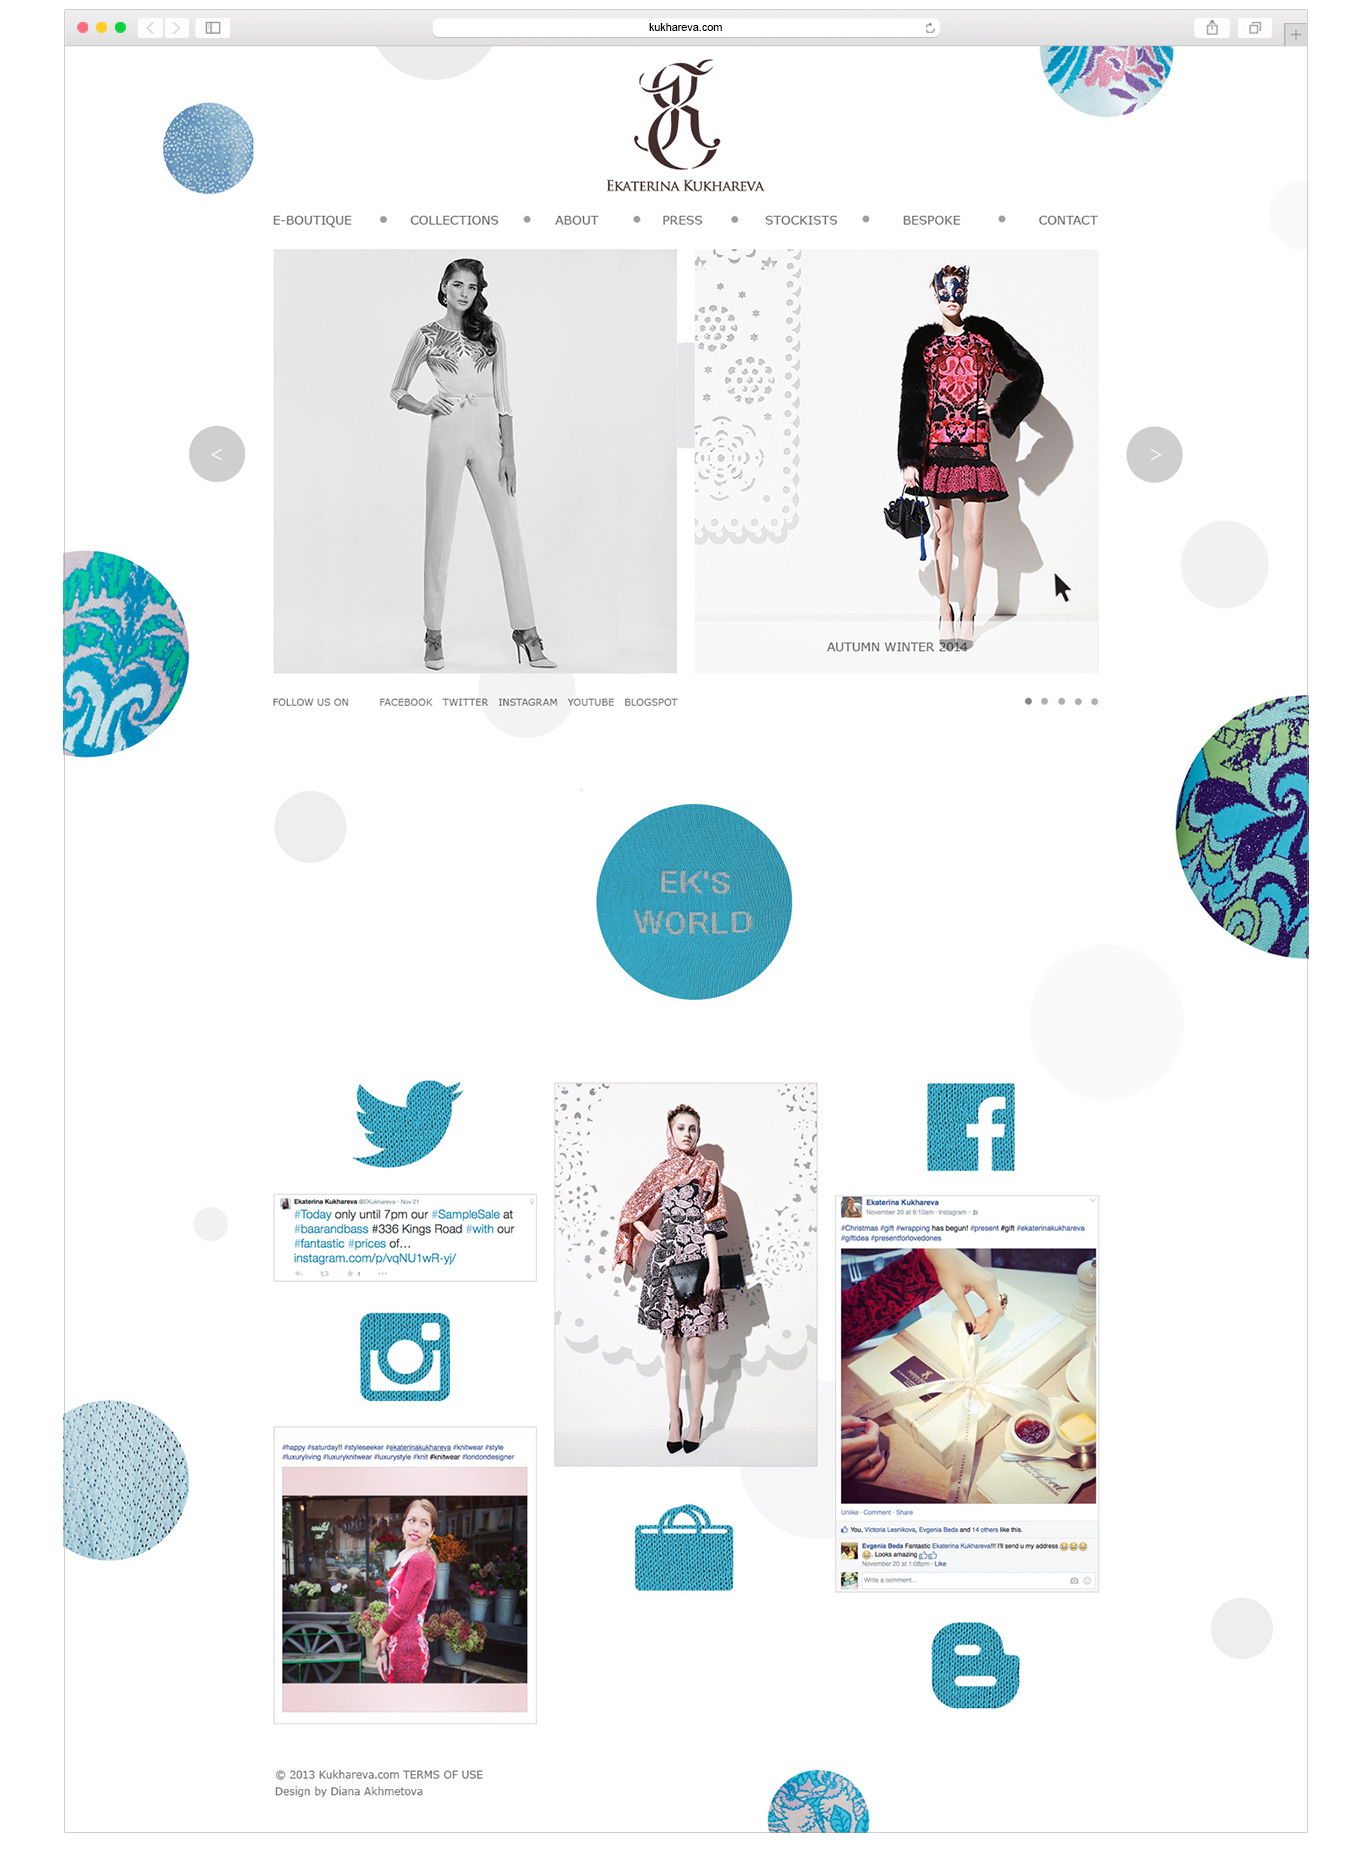 Safari PSD Mockup_ek_homepage_line.jpg